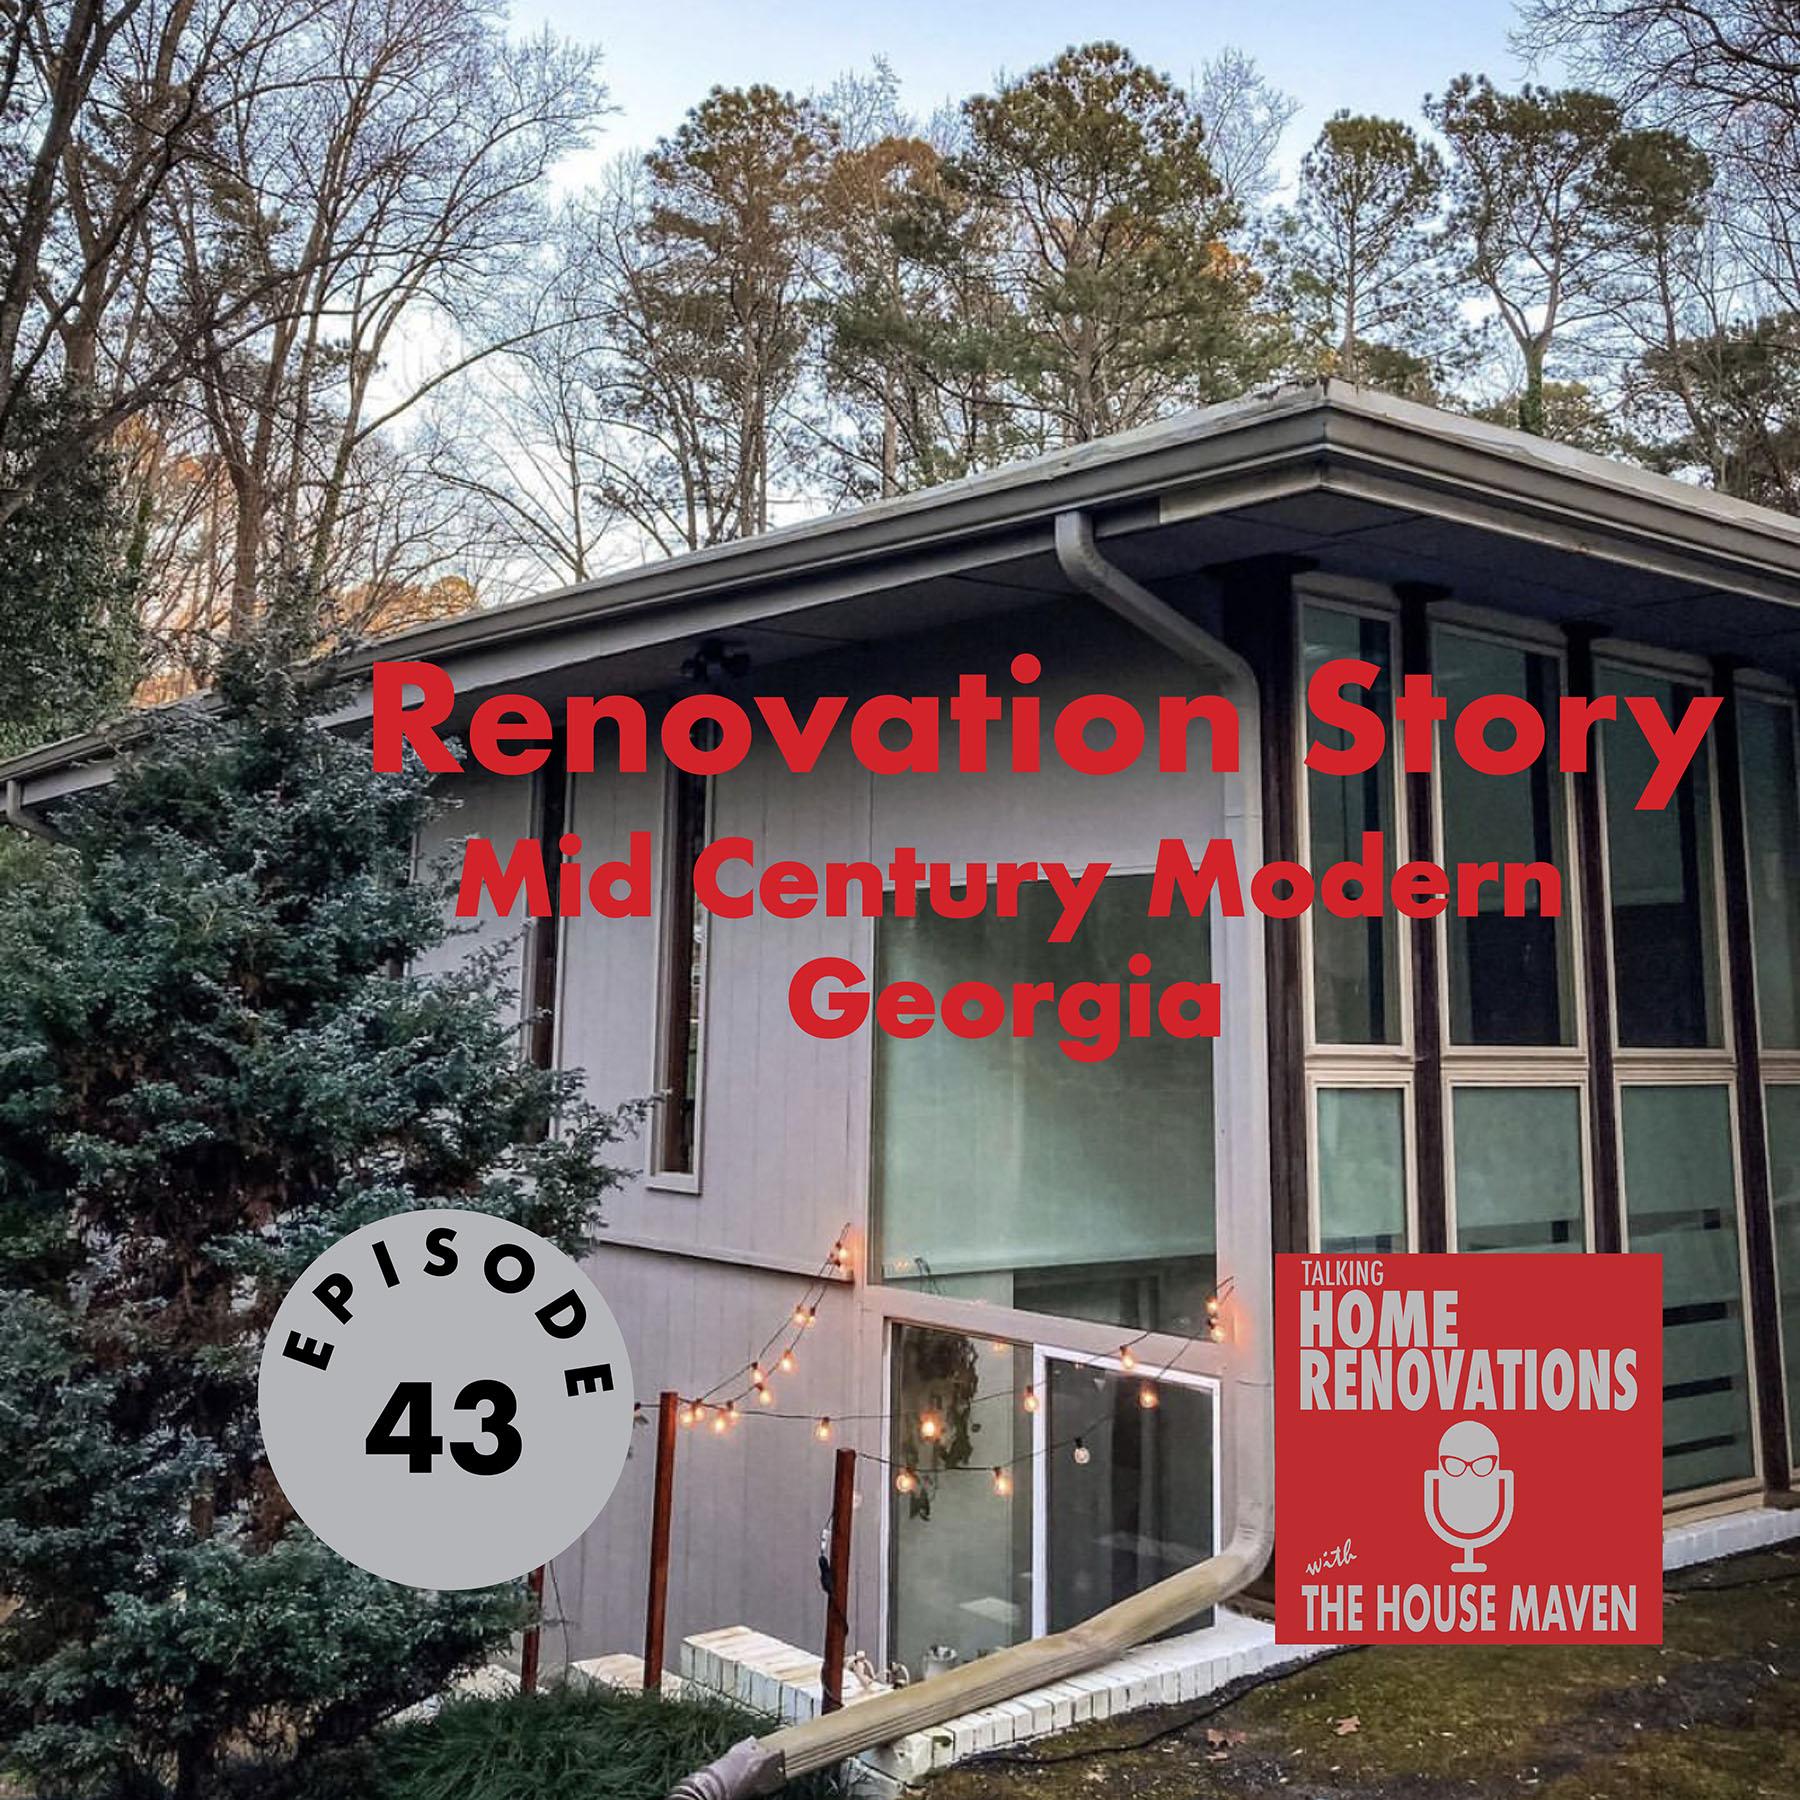 Renovation Story- Mid Century Modern, Georgia